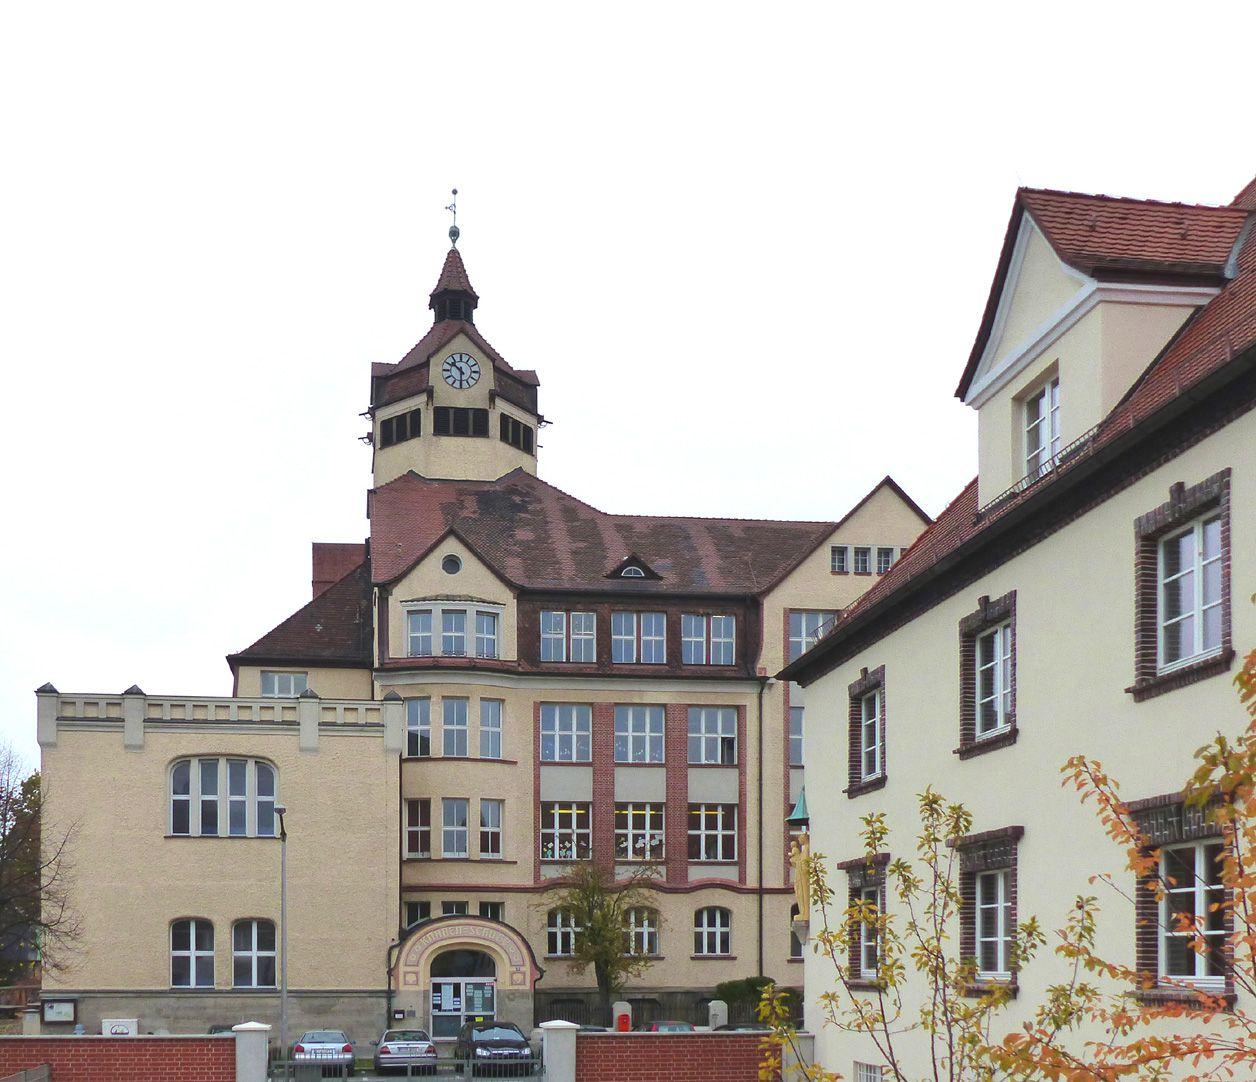 Scharrer-School South corner building with flat roof, boys´ school, building on the right: Nursing association St. Kunigund